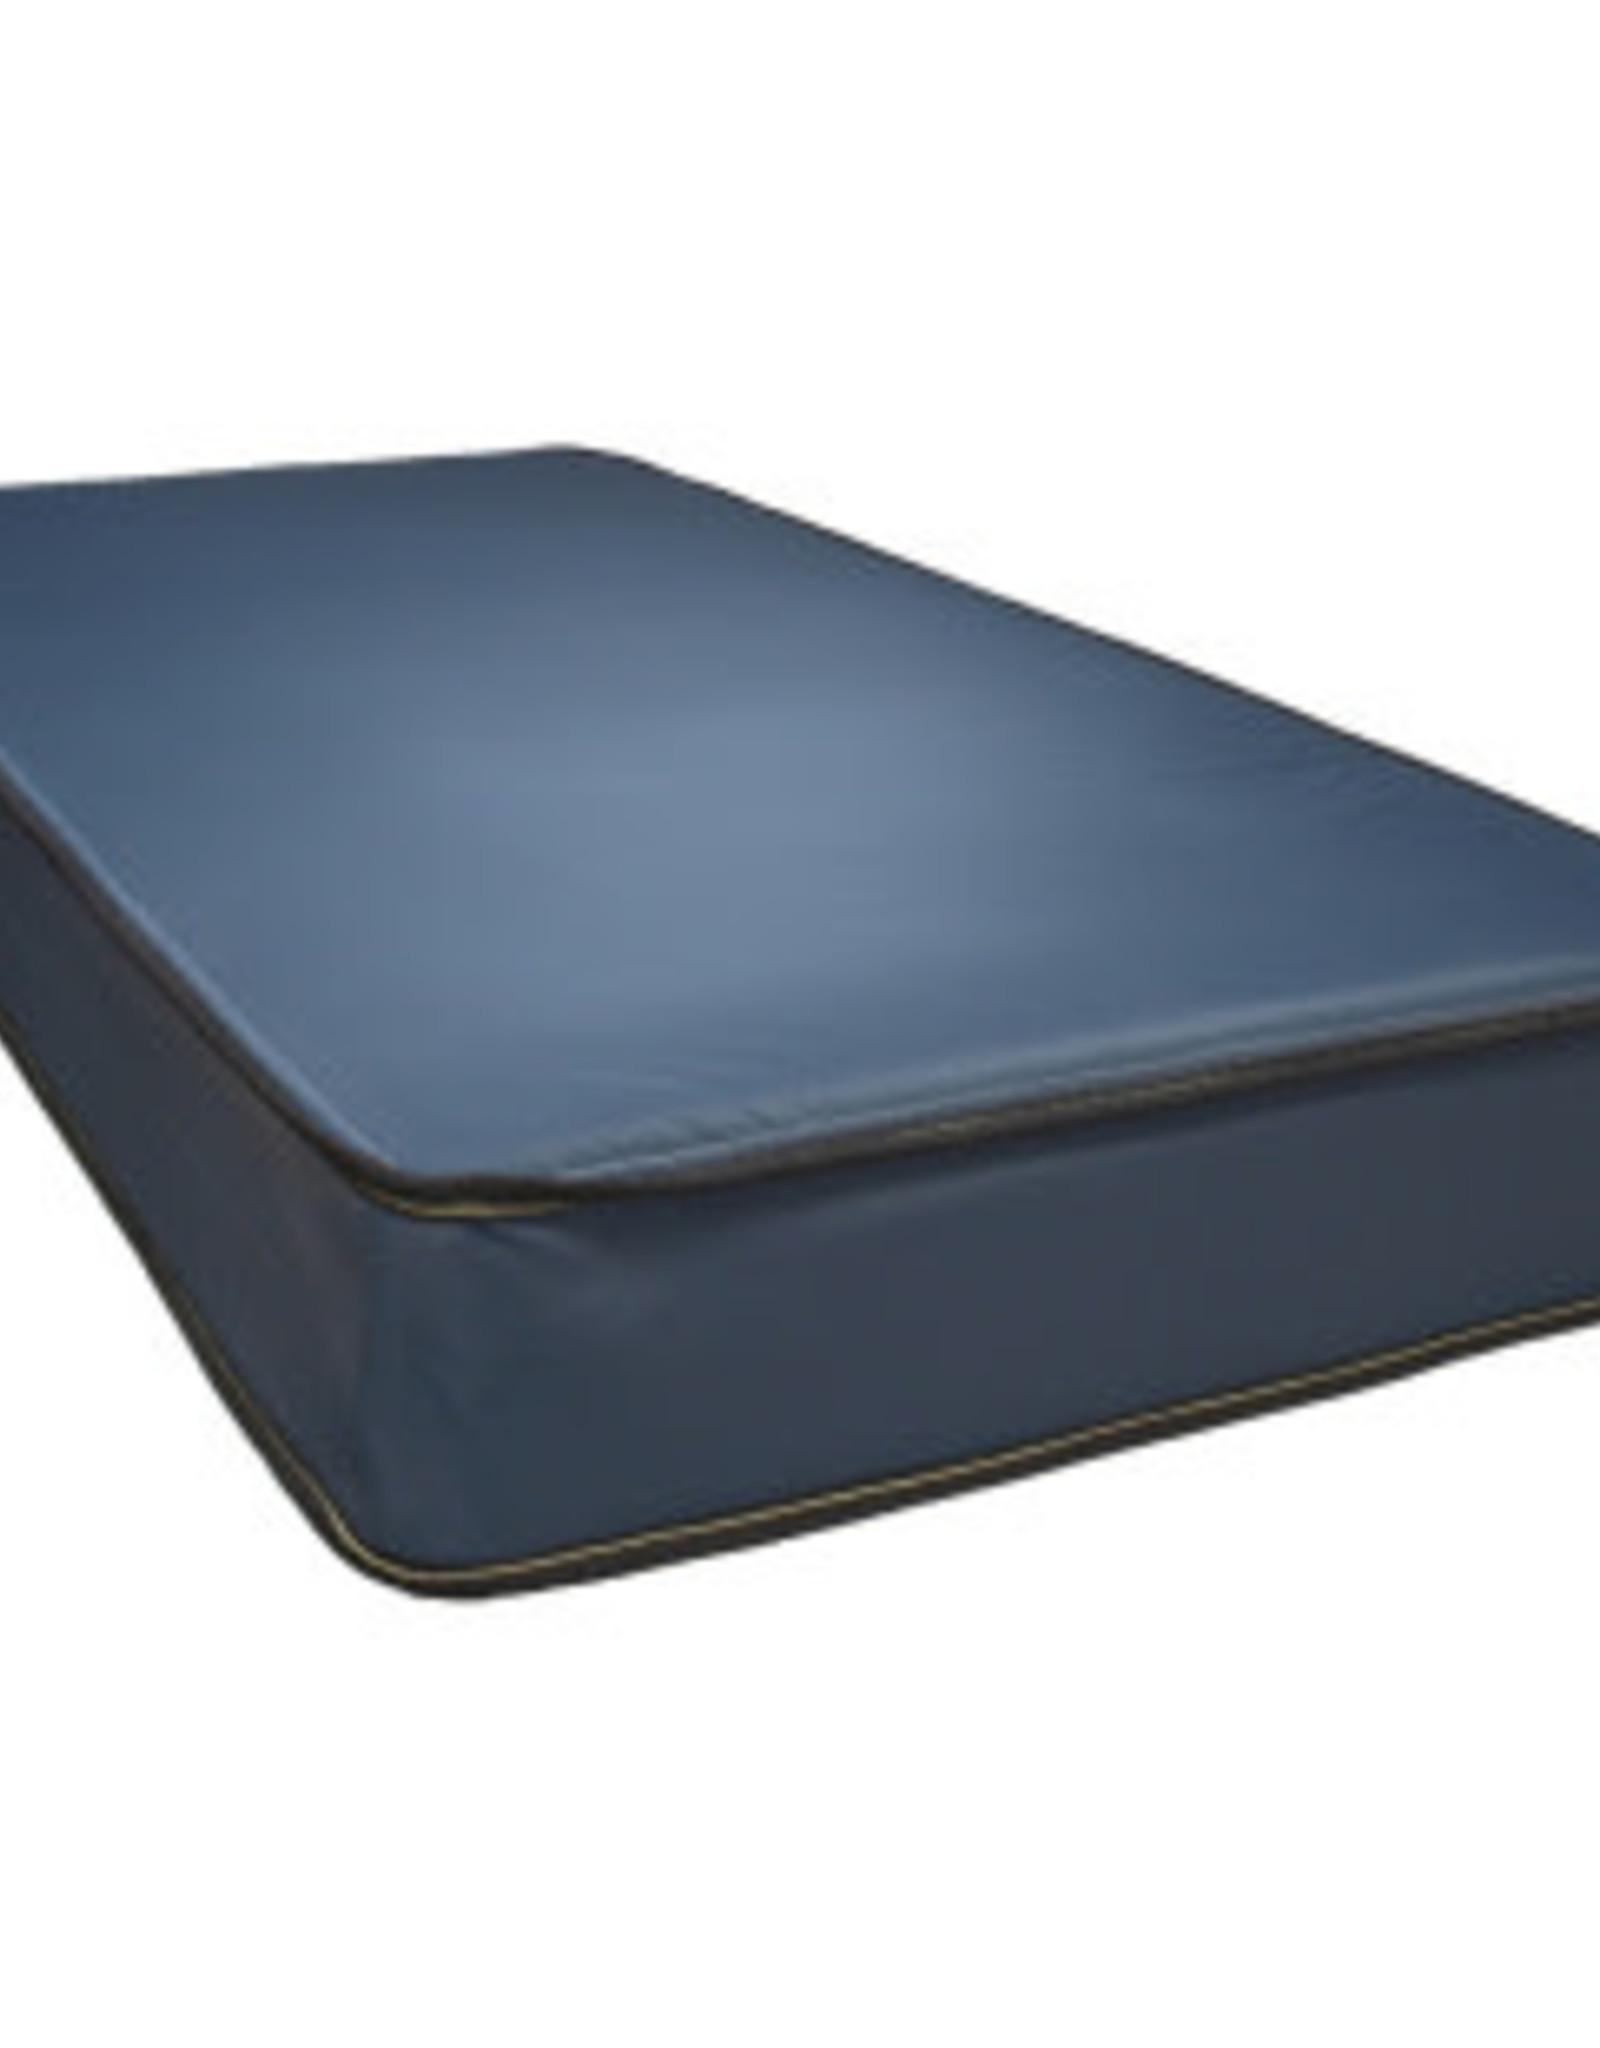 Blue Nylon Water Resistant Mattress